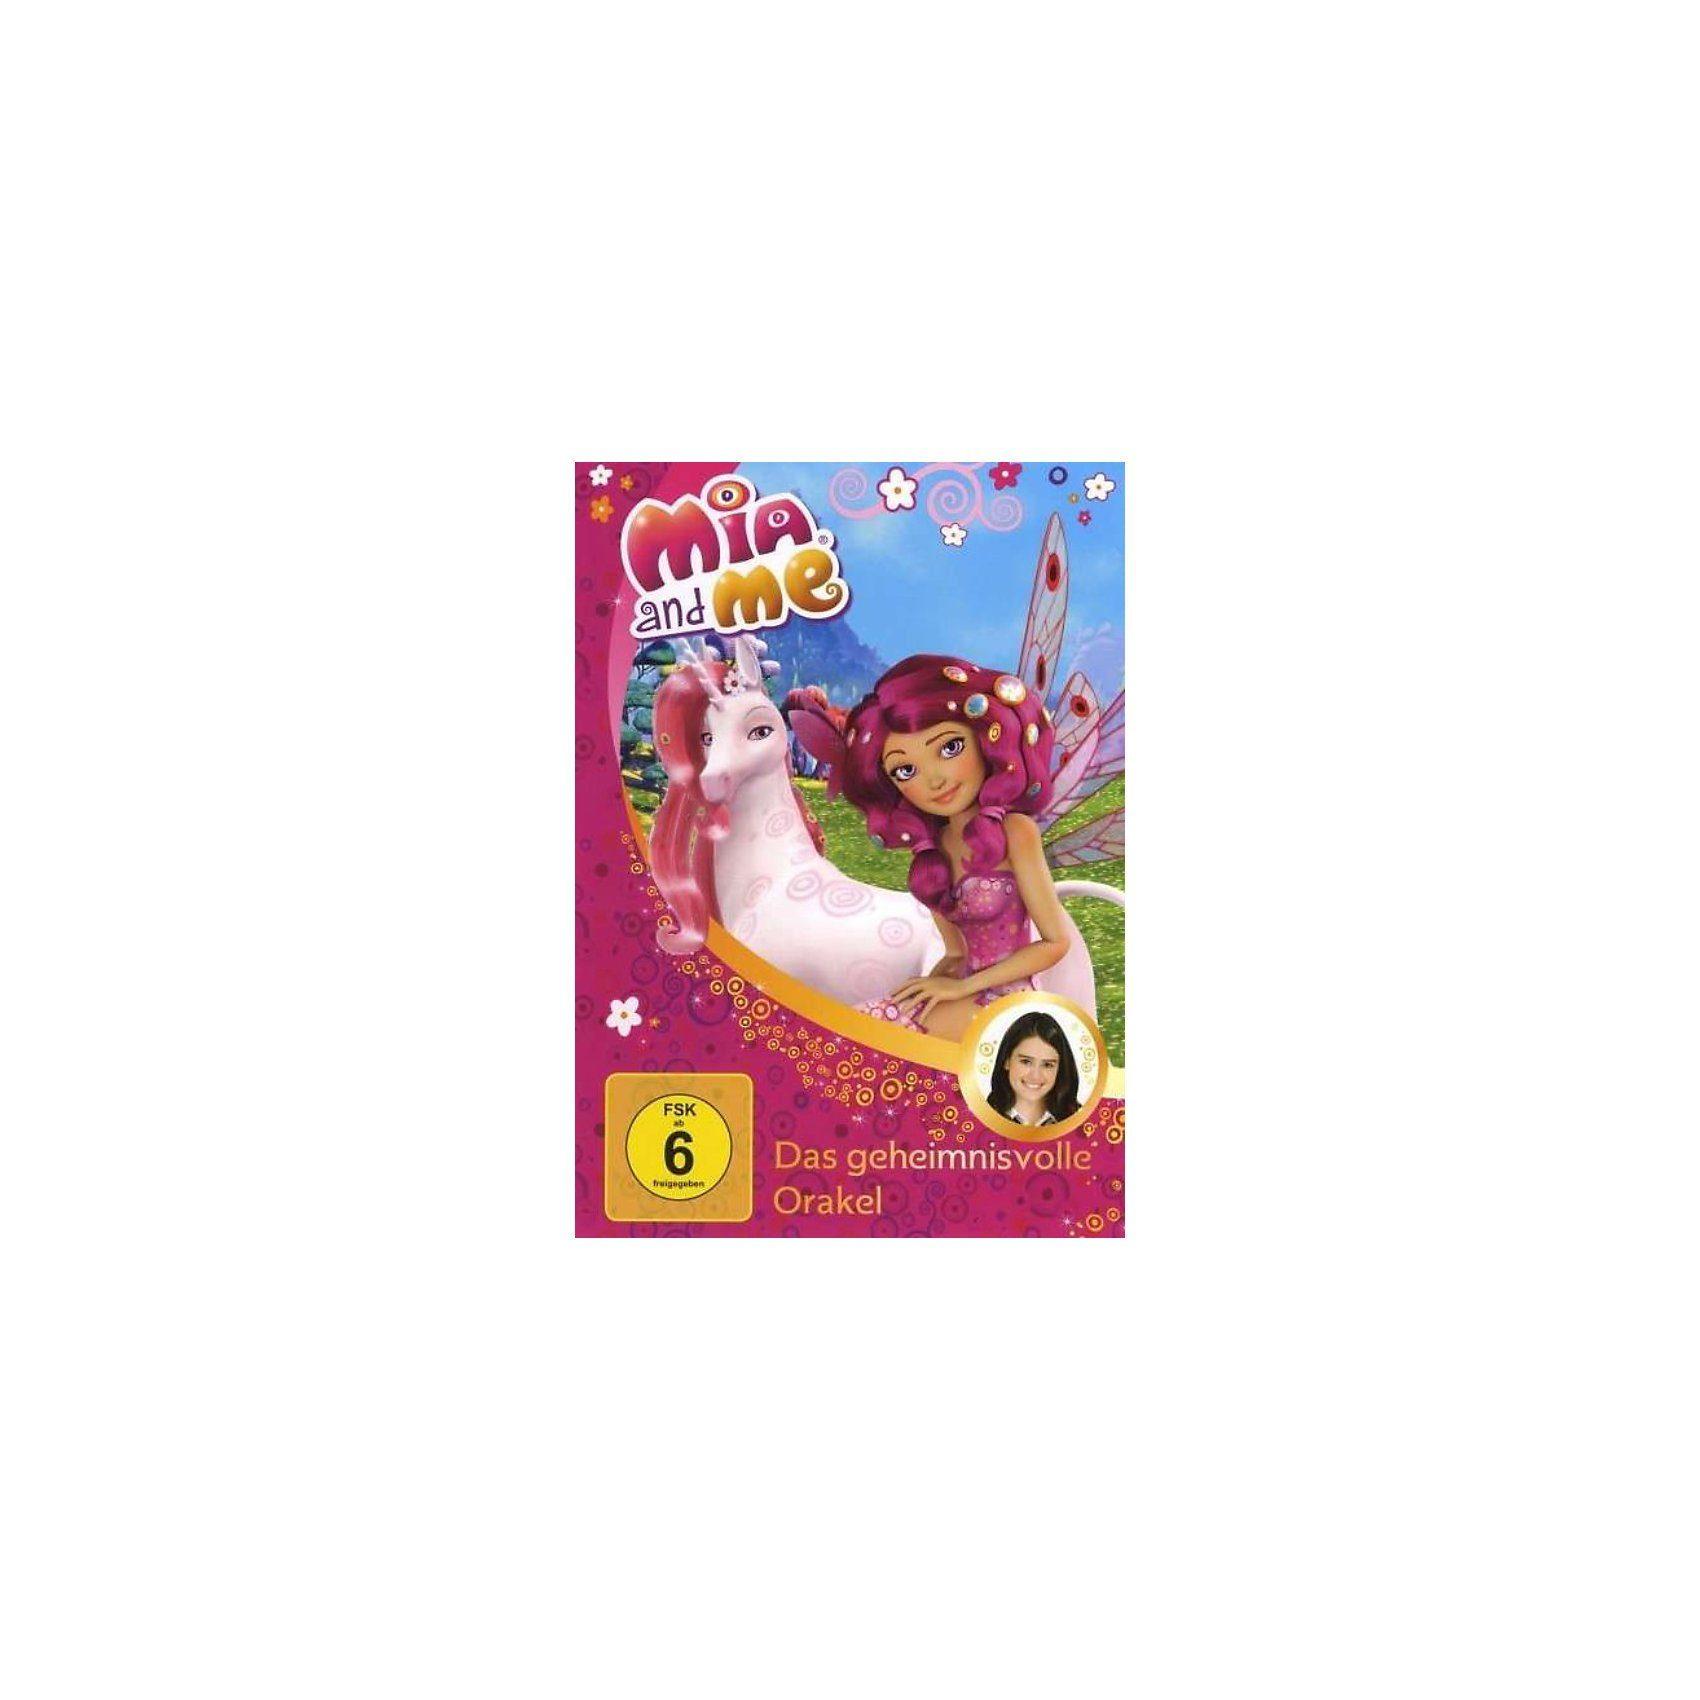 Edel DVD Mia and me 02 - Das geheimnisvolle Orakel